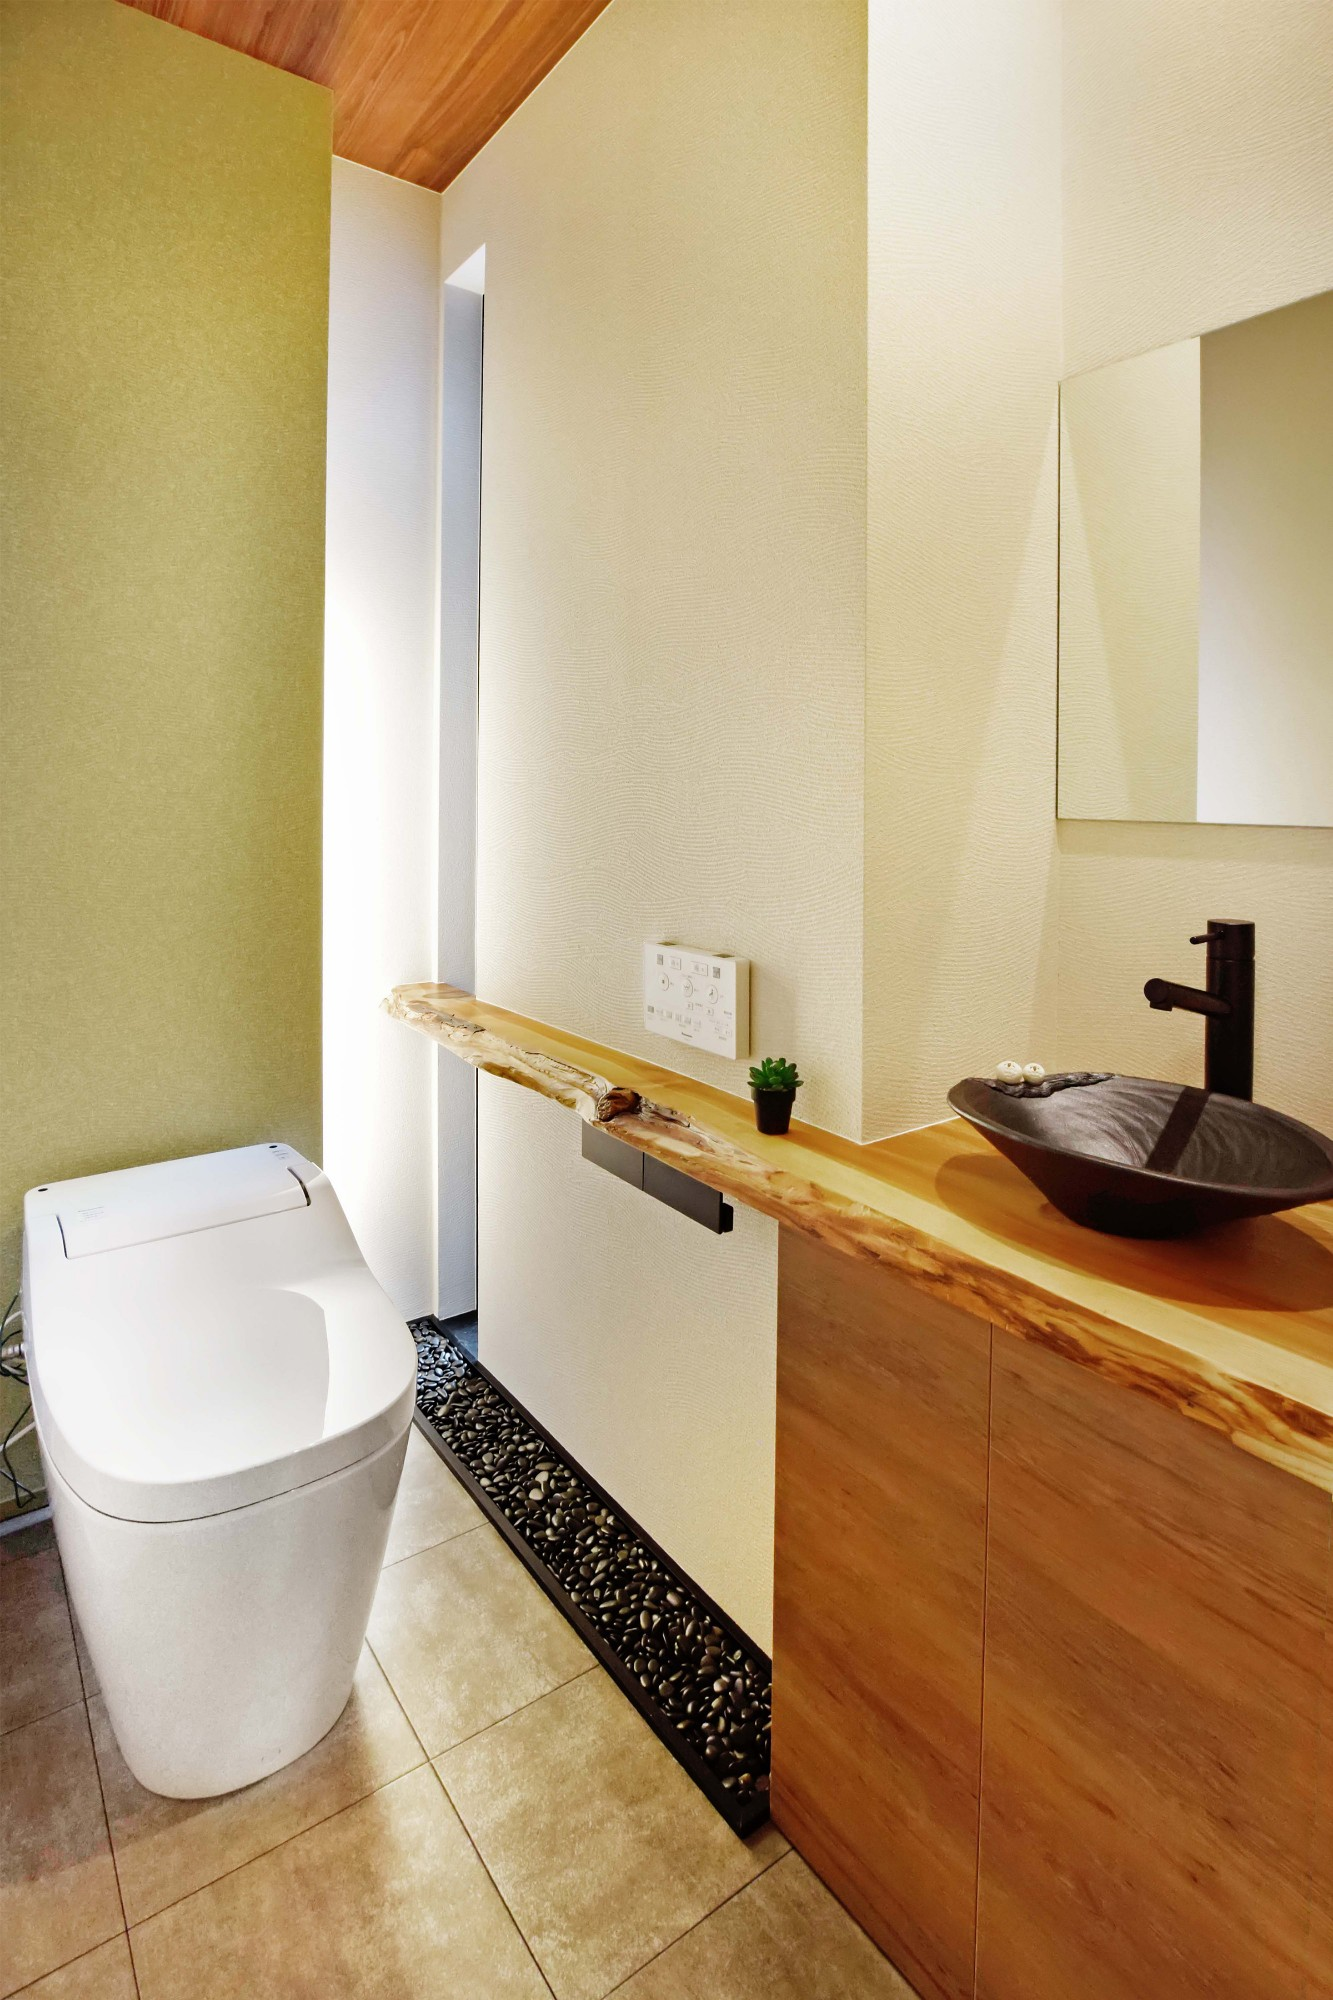 DETAIL HOME(ディテールホーム)「和と洋の溶け合う心地いい暮らし」の和風・和モダンなトイレの実例写真